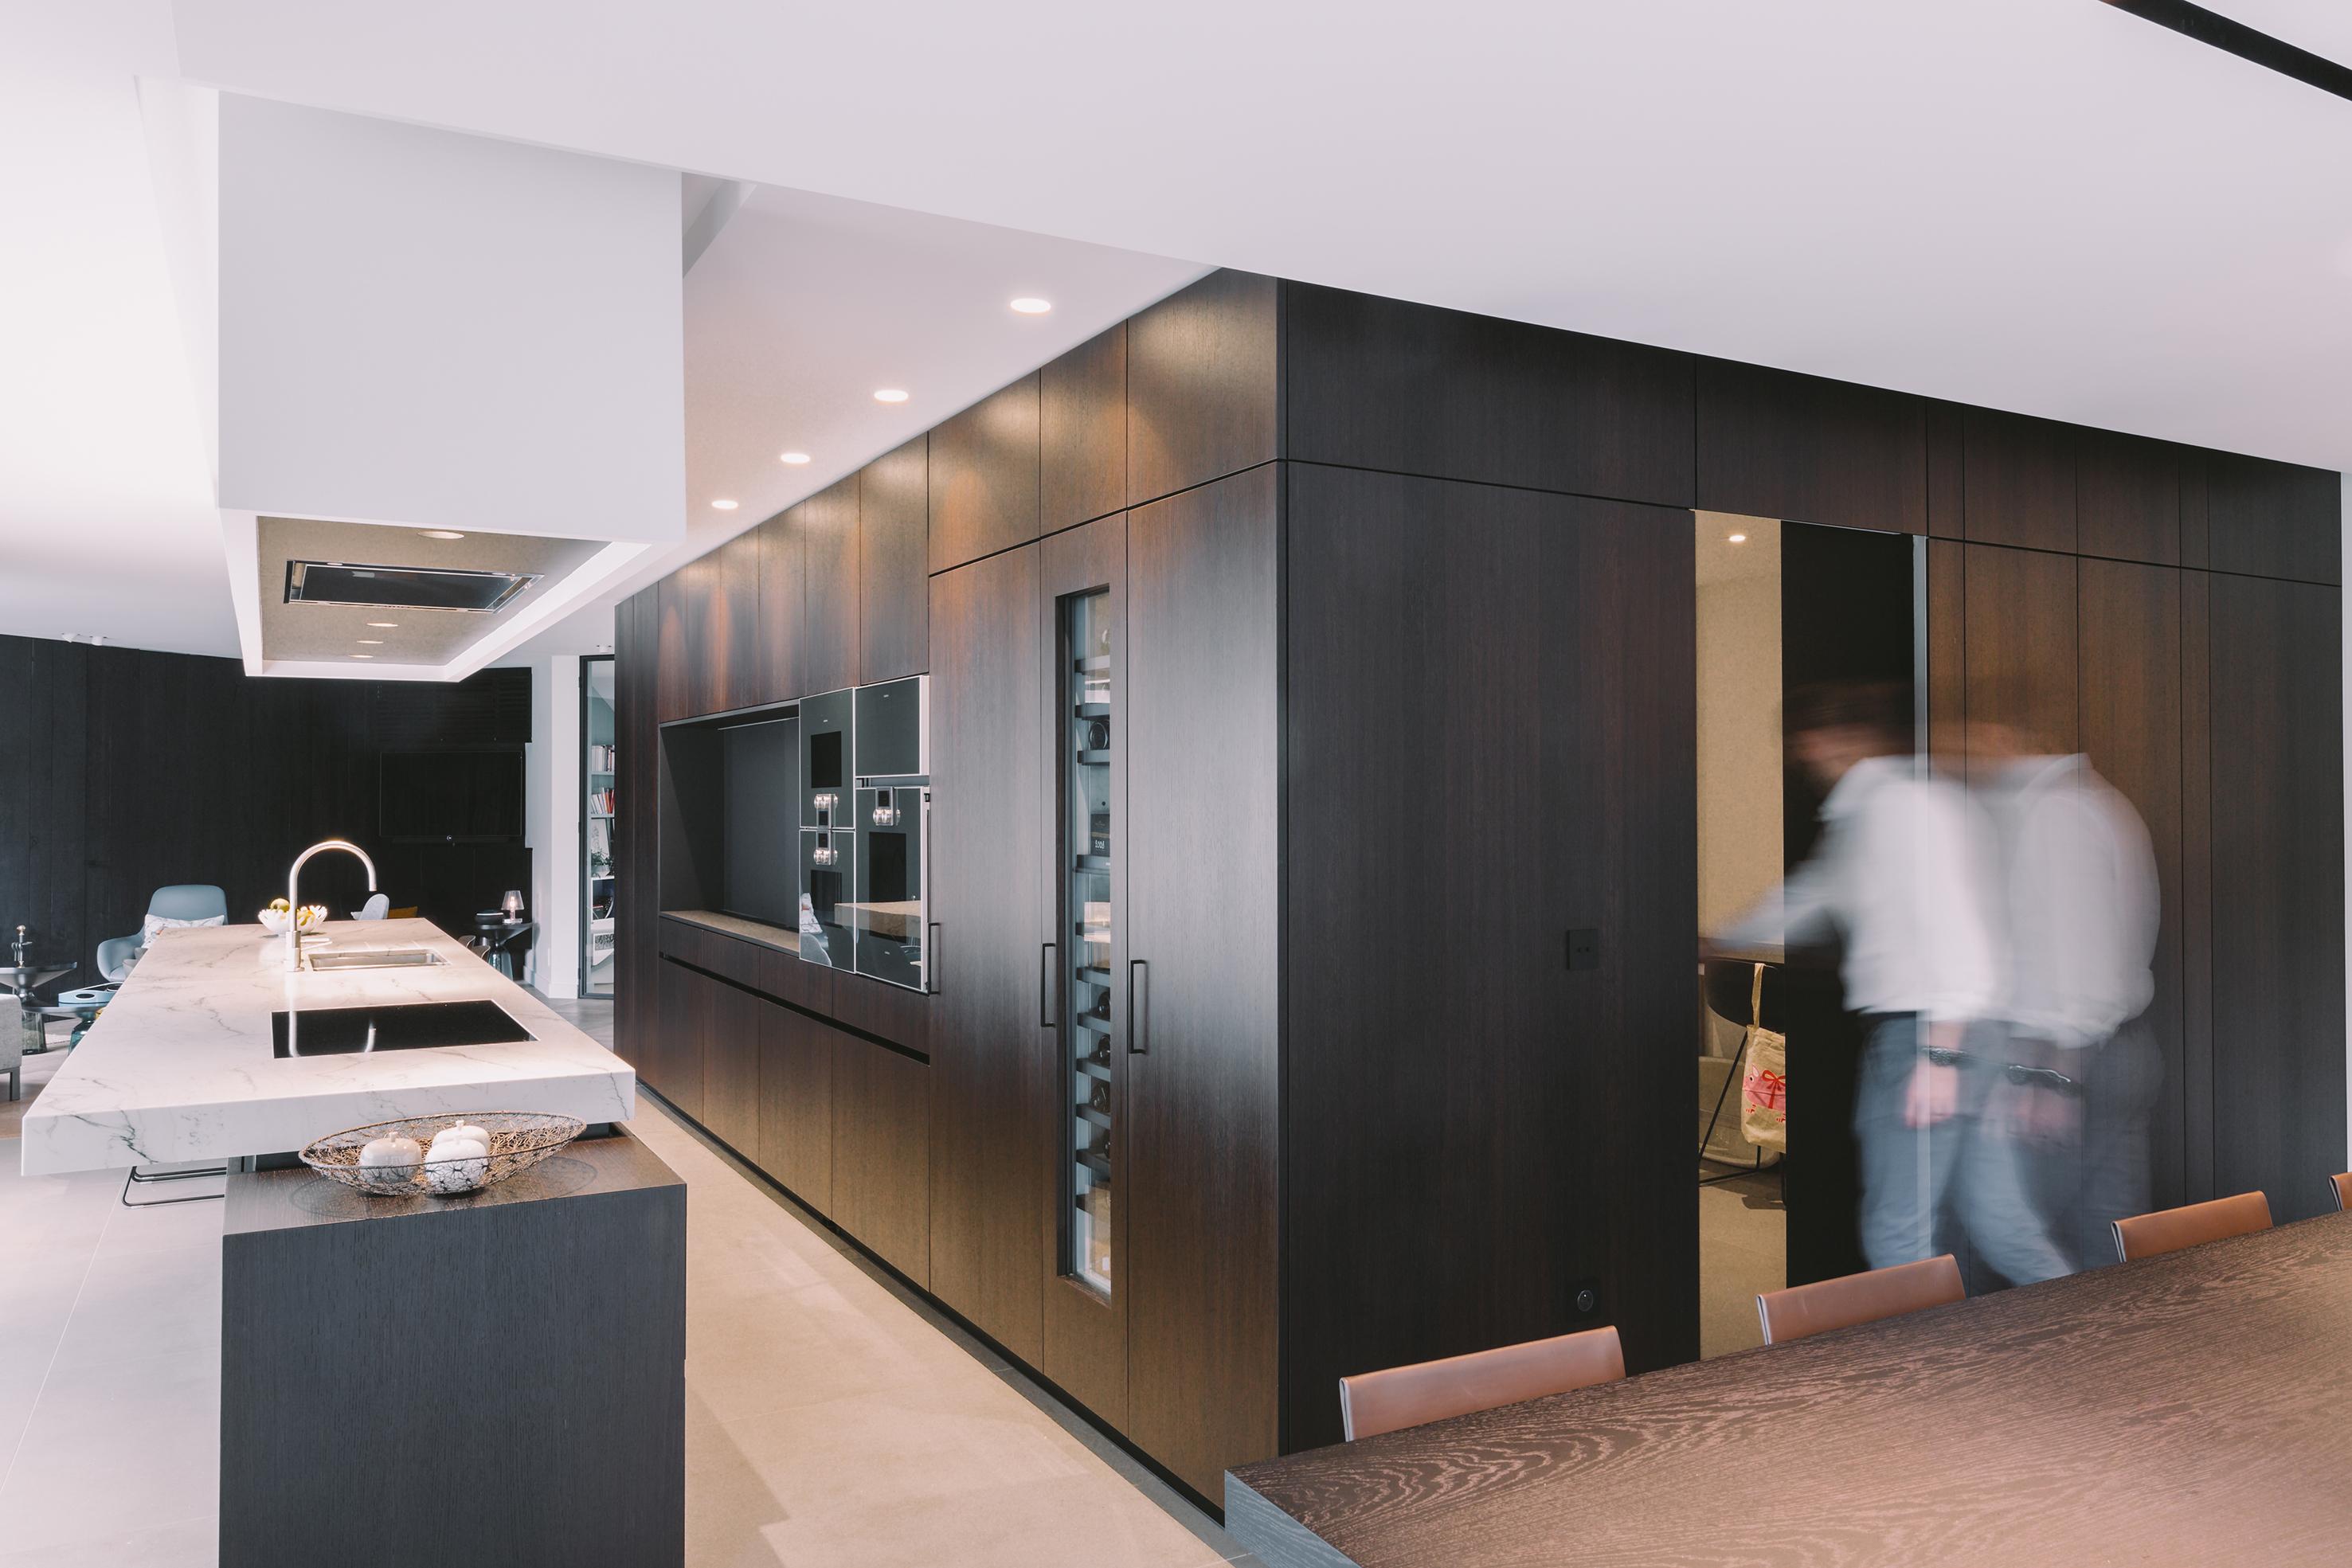 guillaume da silva architecte d\'intérieur cuisine habitat ...